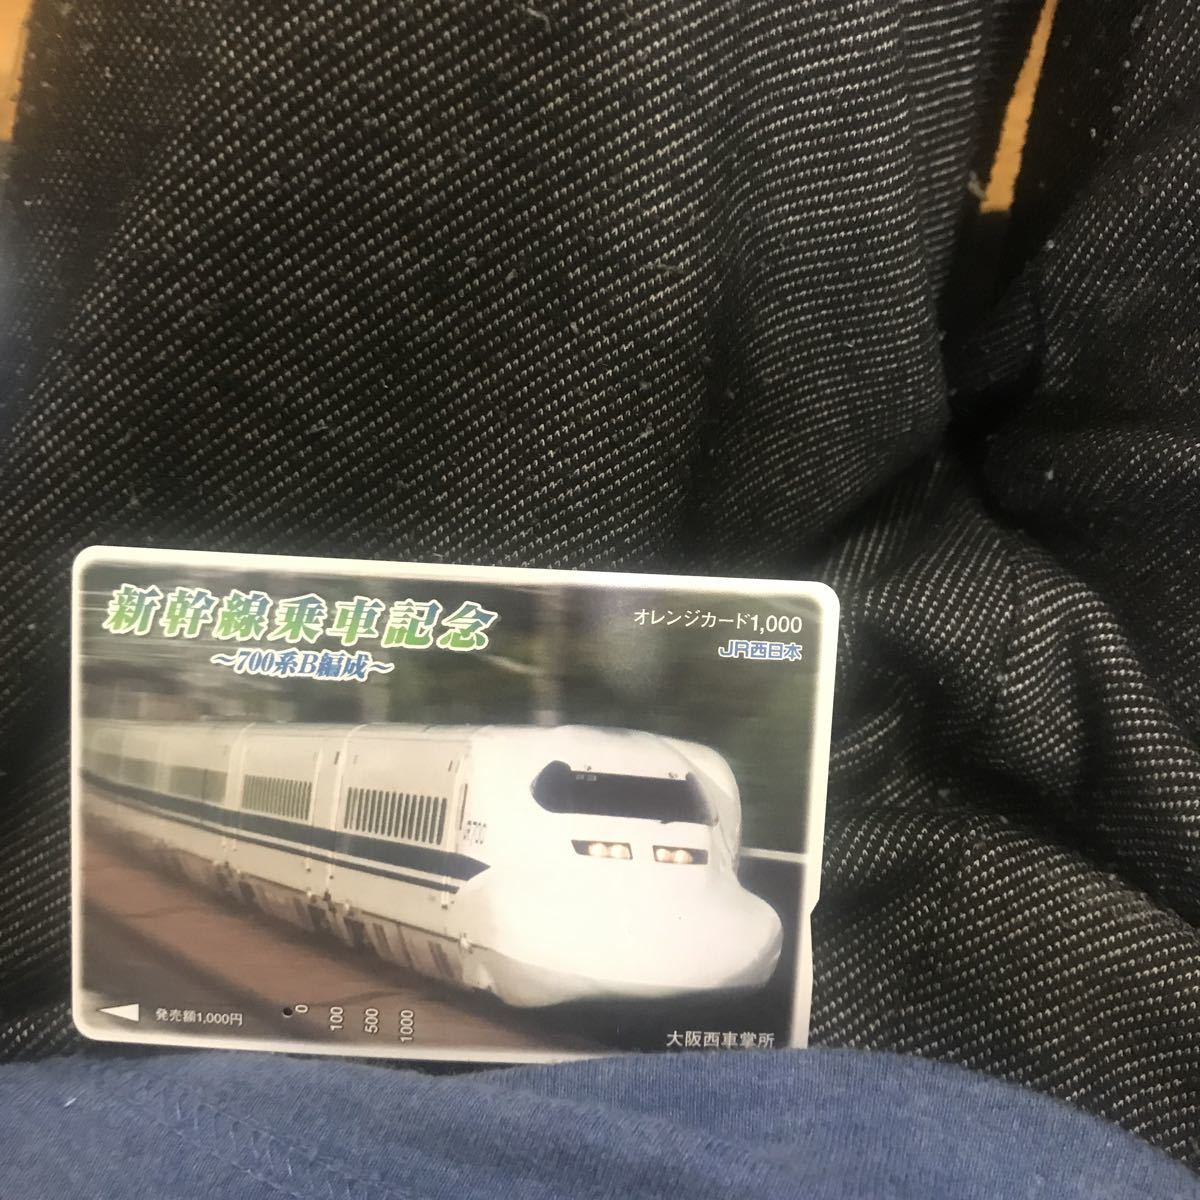 オレンジカードJR西日本新幹線乗車記念700系b編成大阪西車掌所_画像1